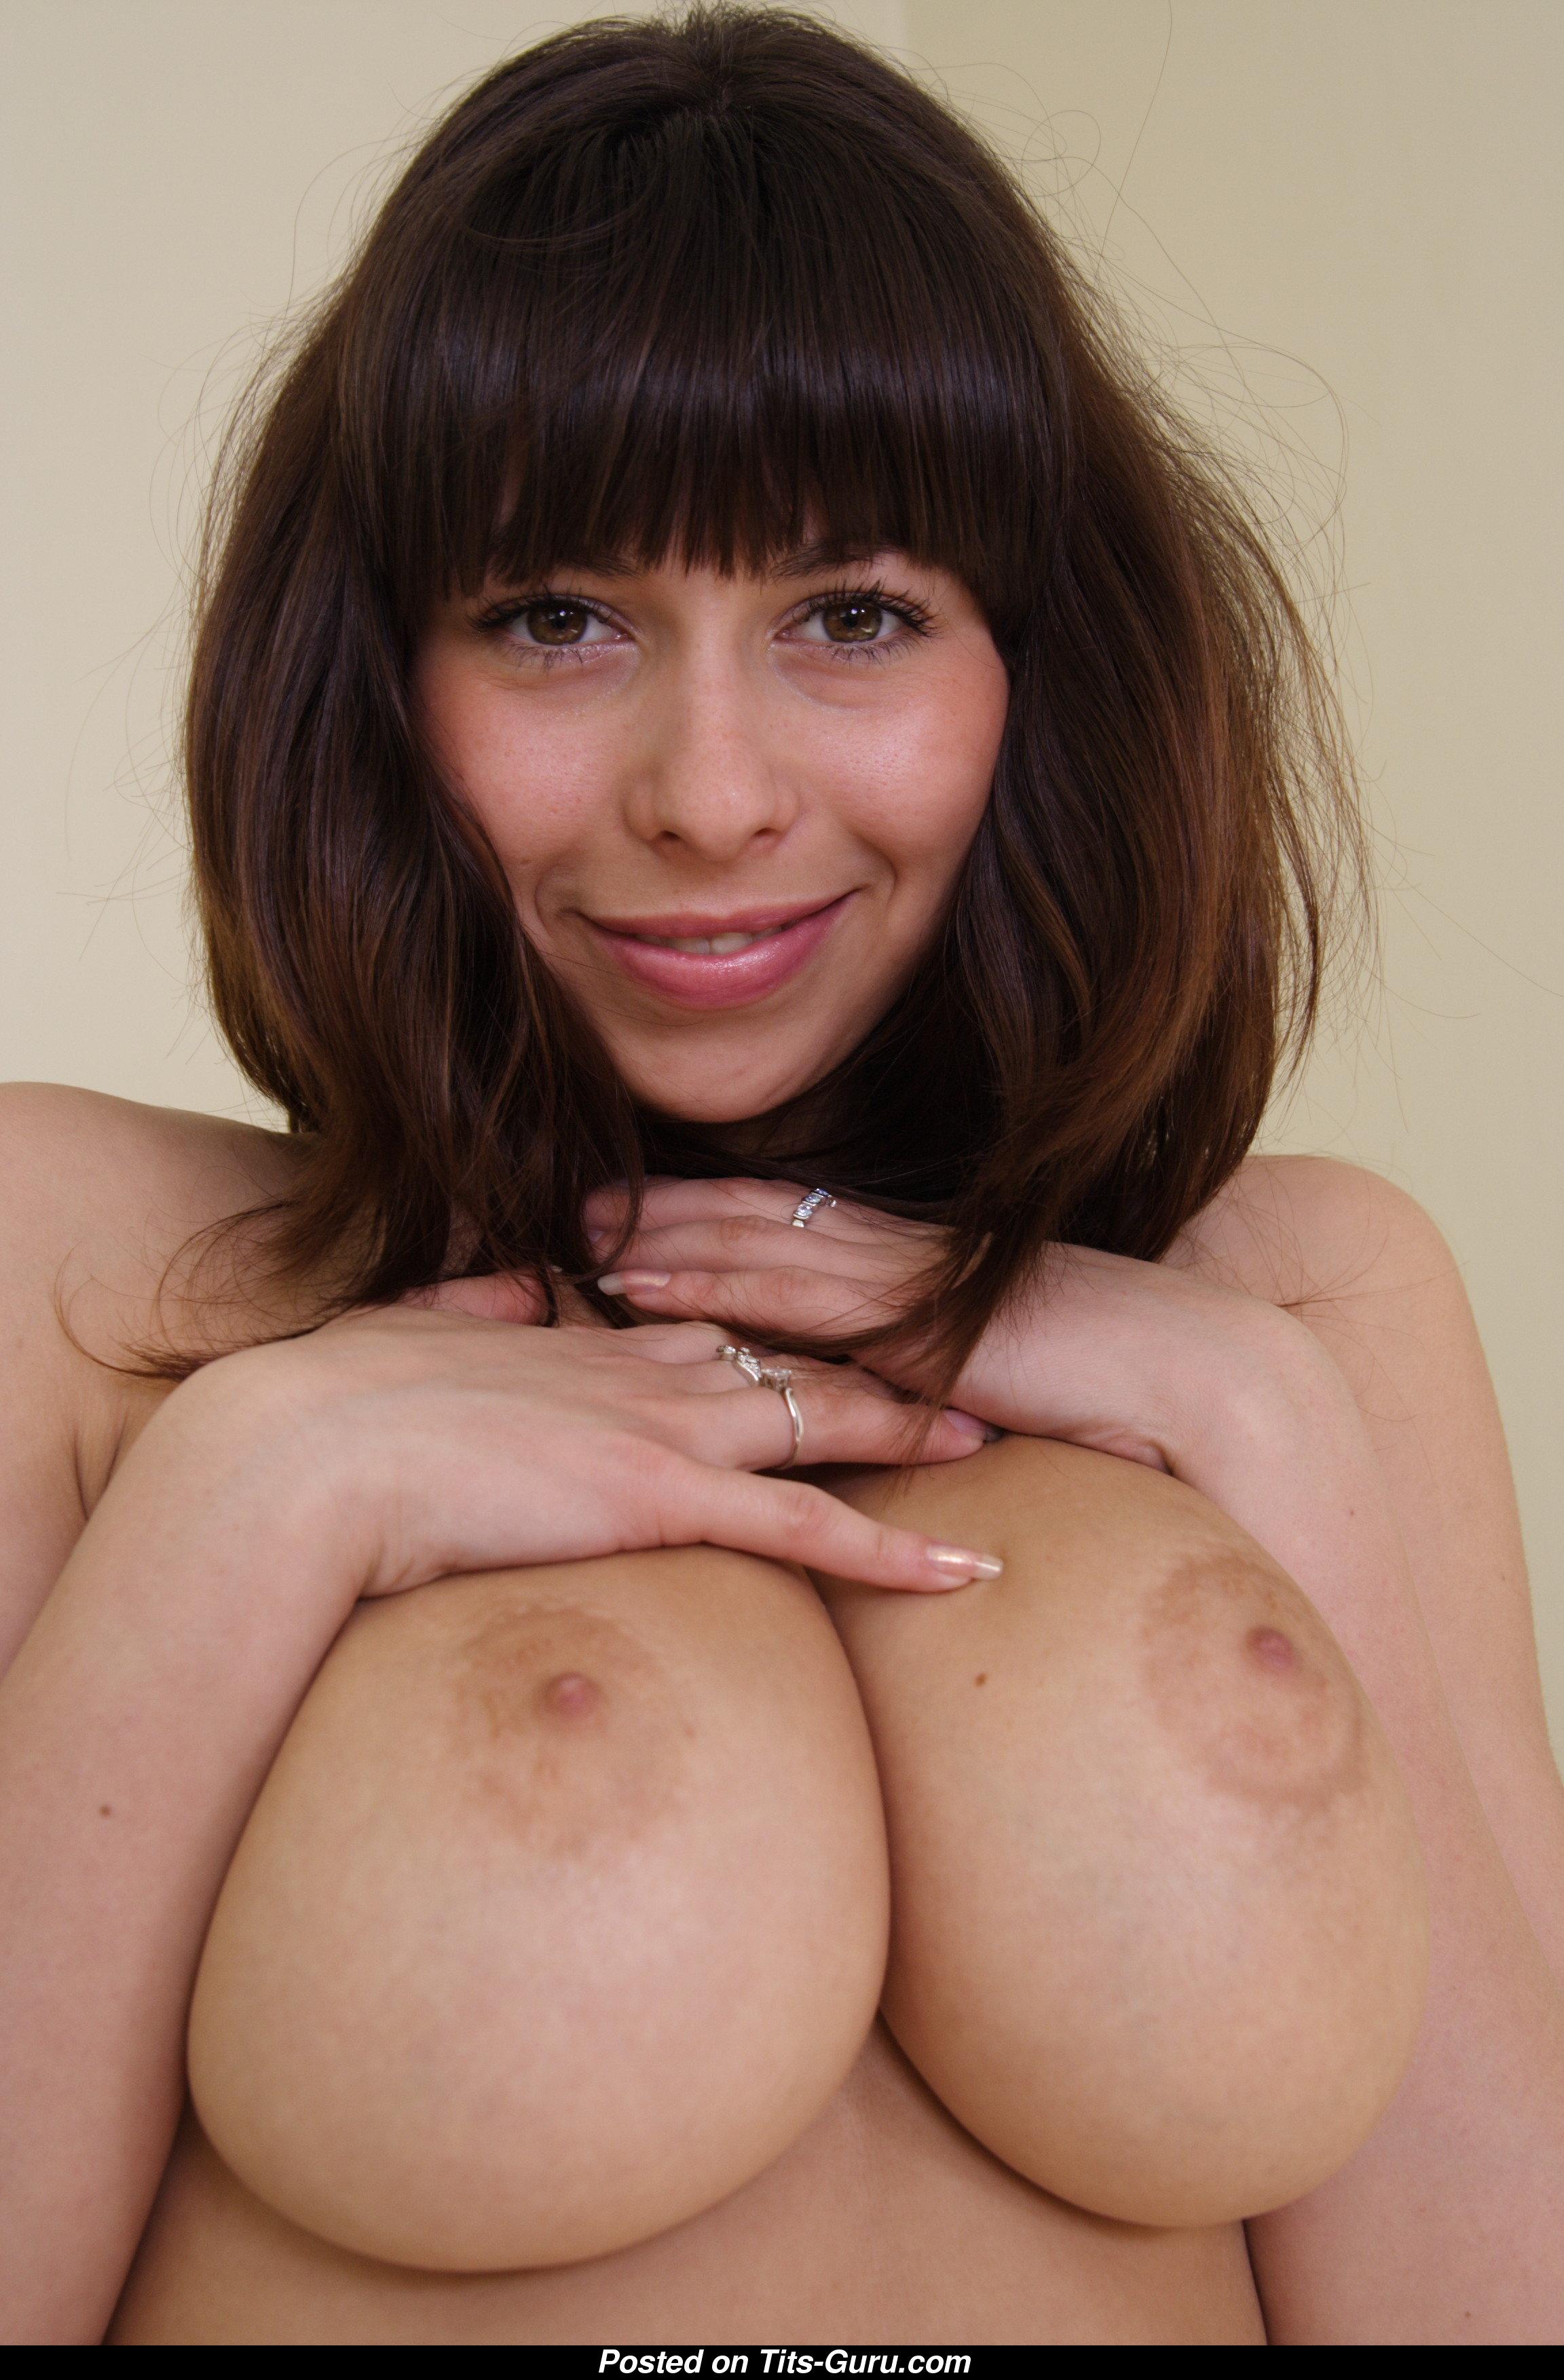 naked beautiful girls squirting